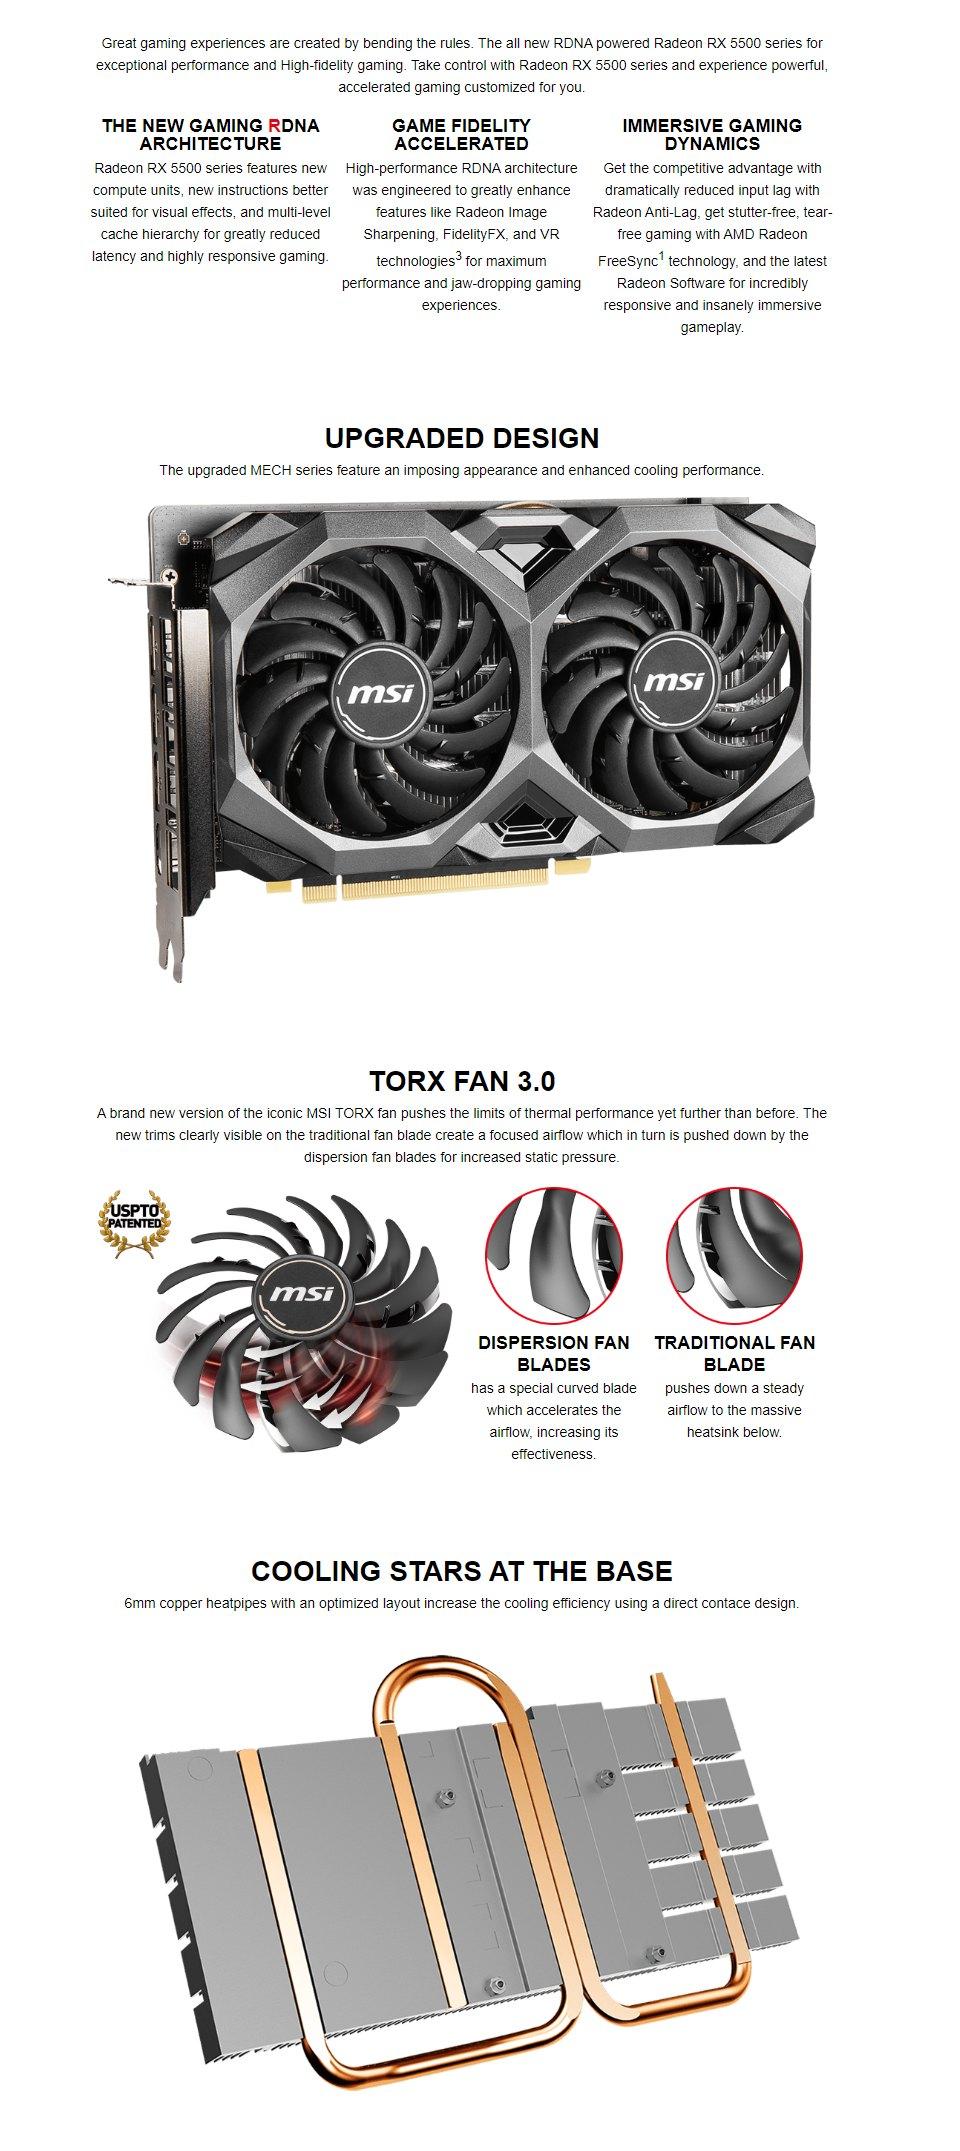 MSI Radeon RX 5500 XT Mech OC 8GB features 2